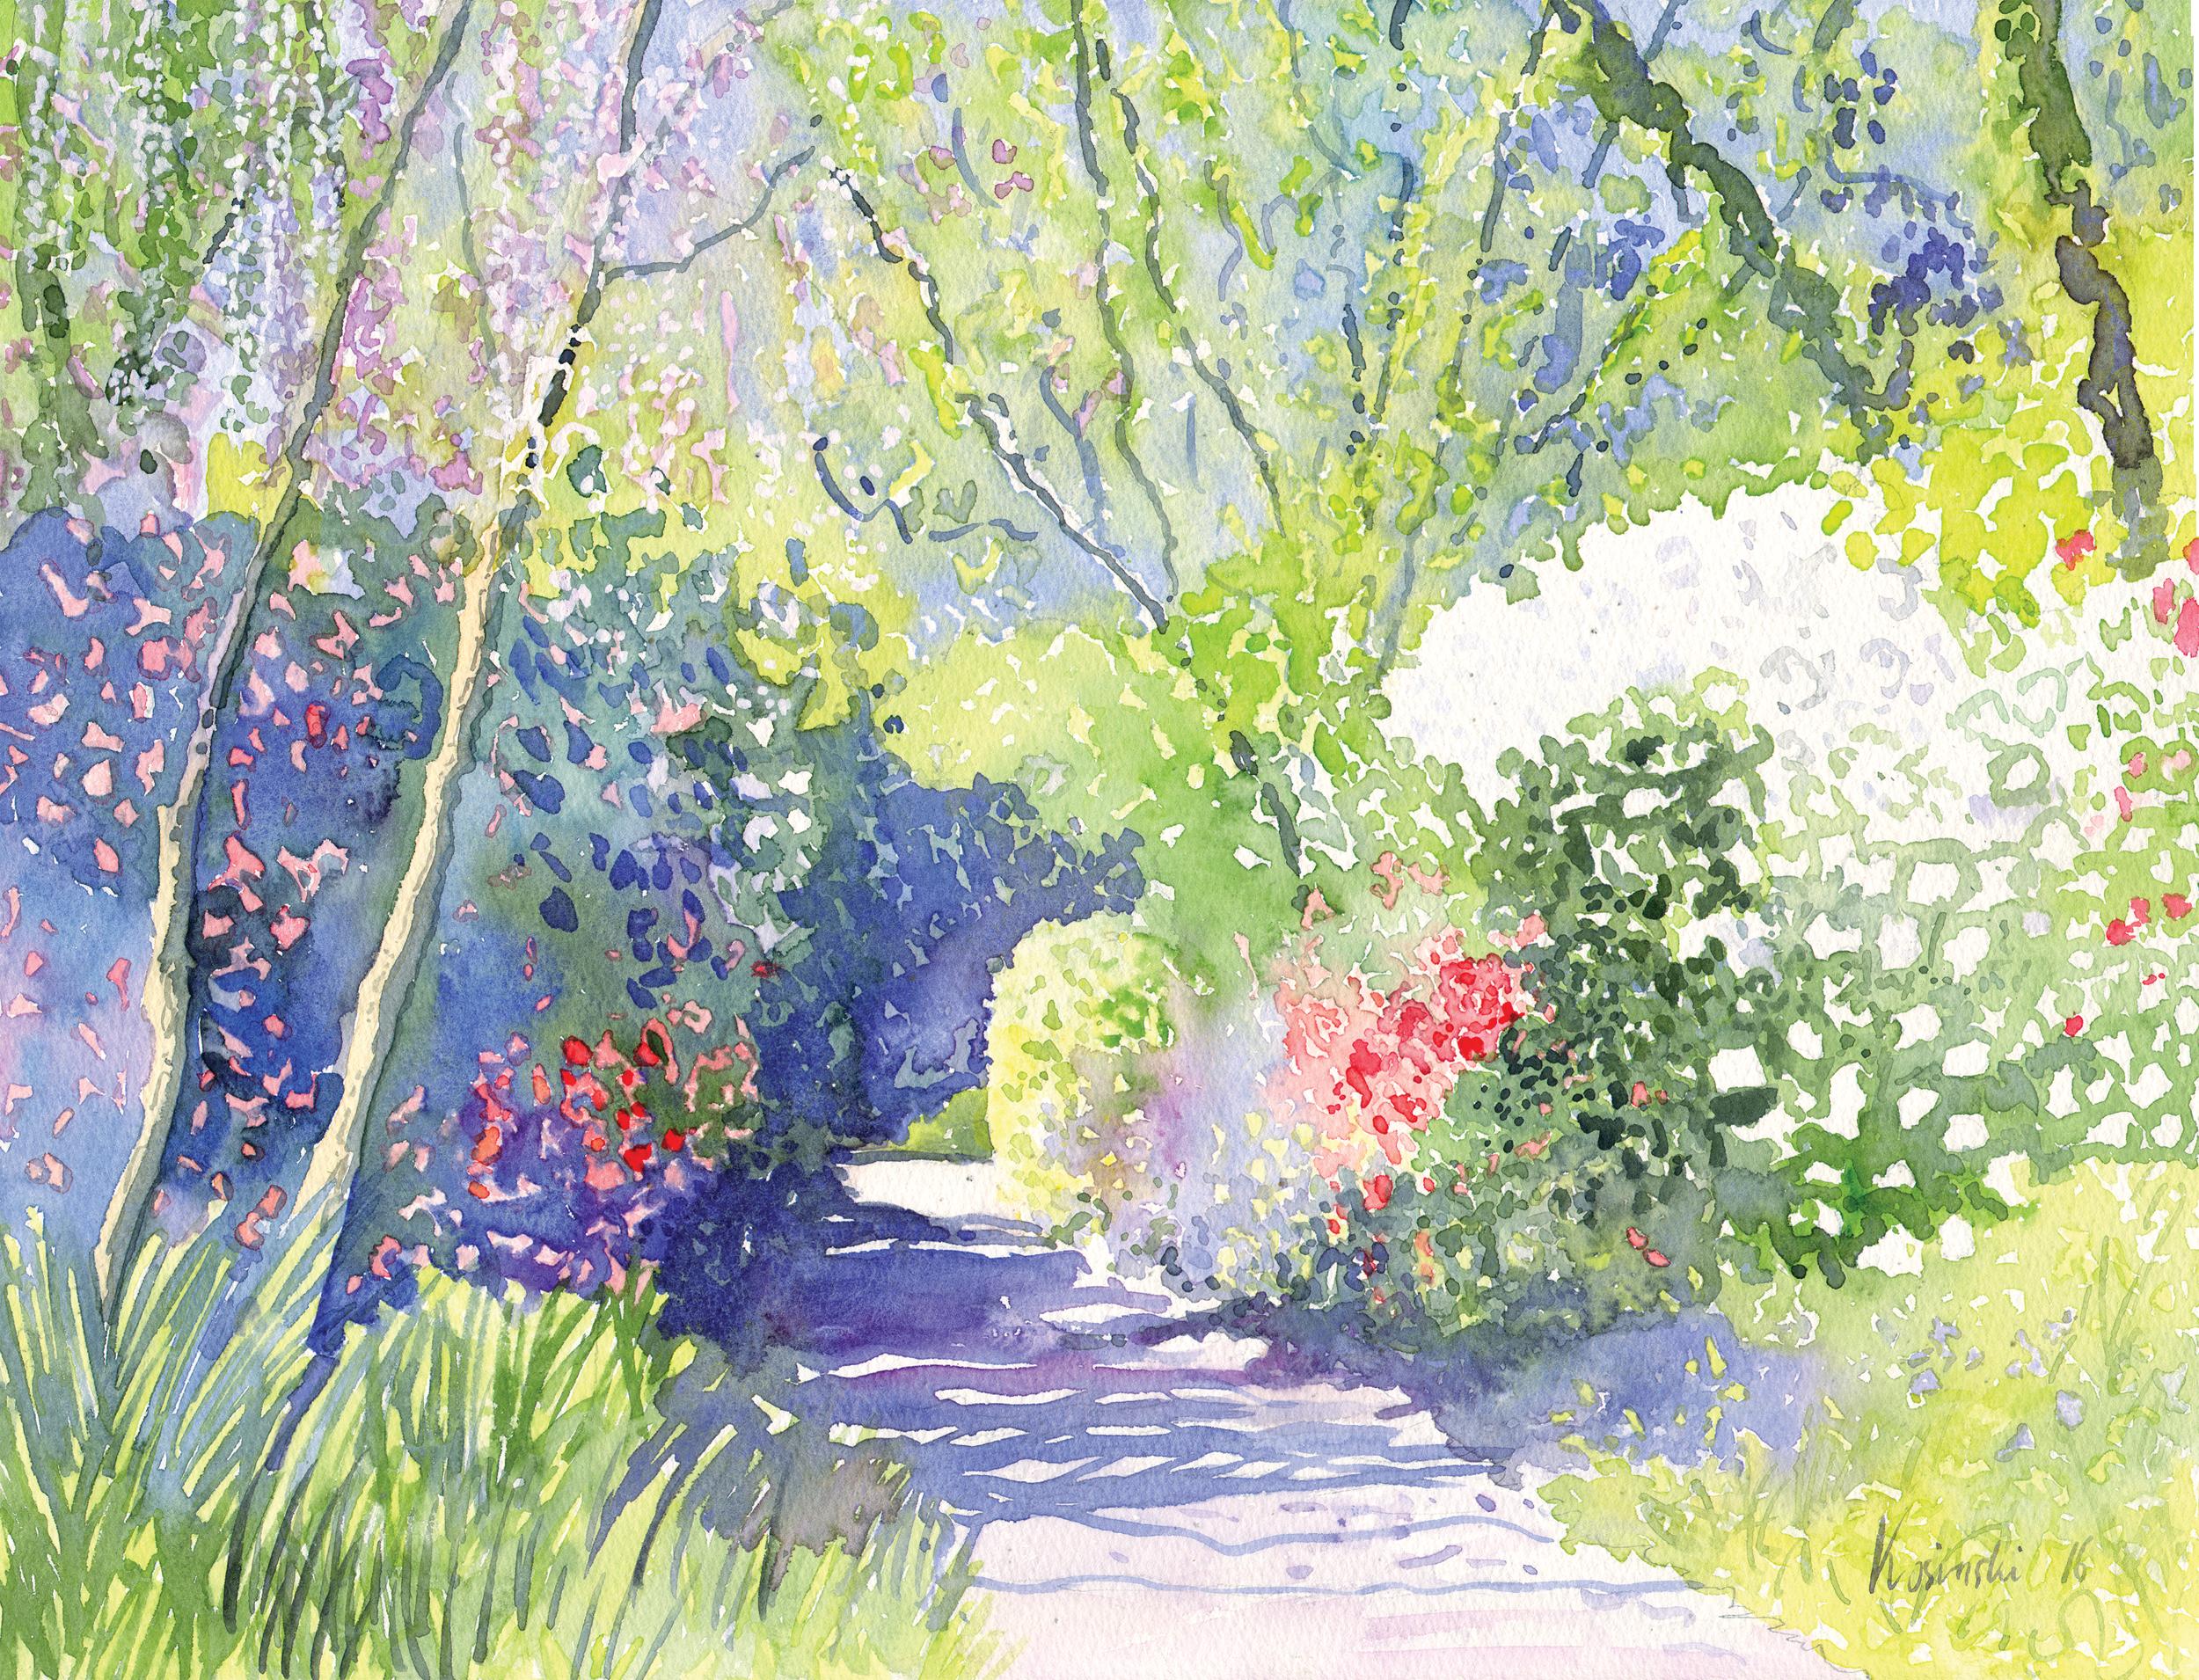 Garden Path, Brookgreen Gardens, SC